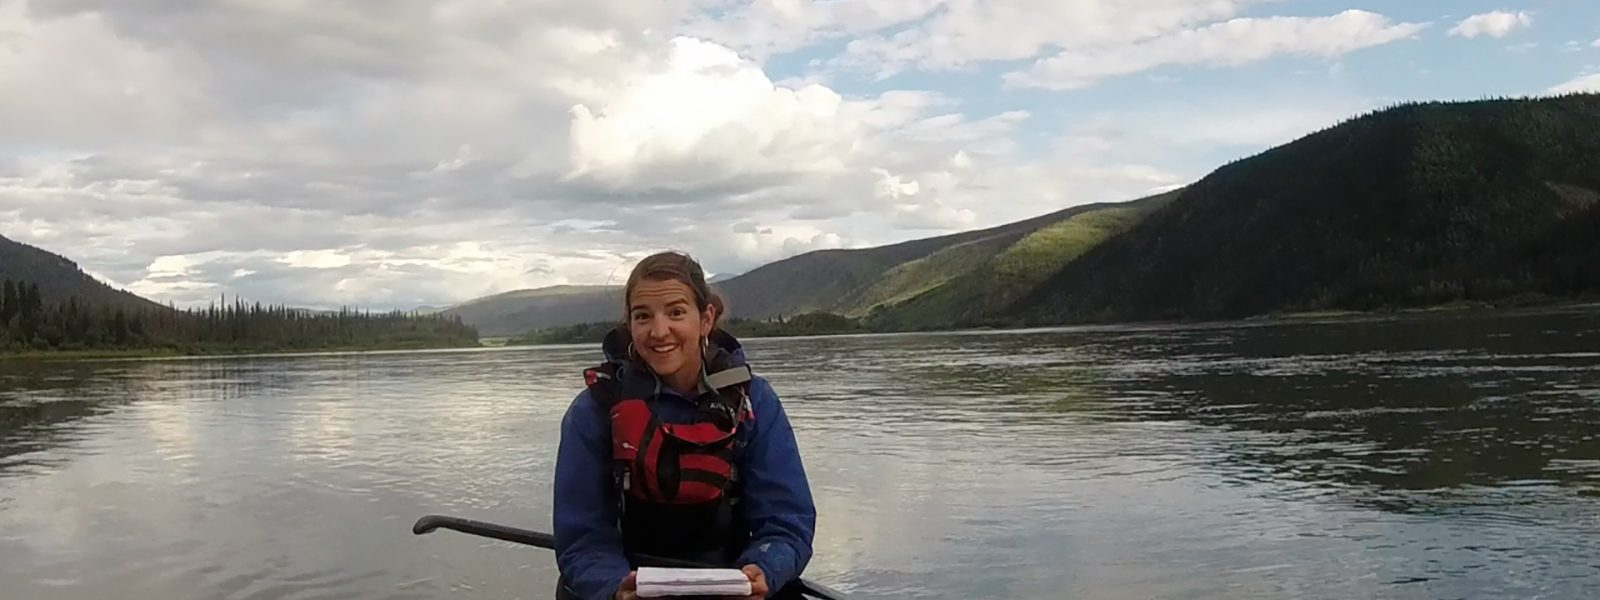 Northland College alum Mitzi Peine paddling a canoe